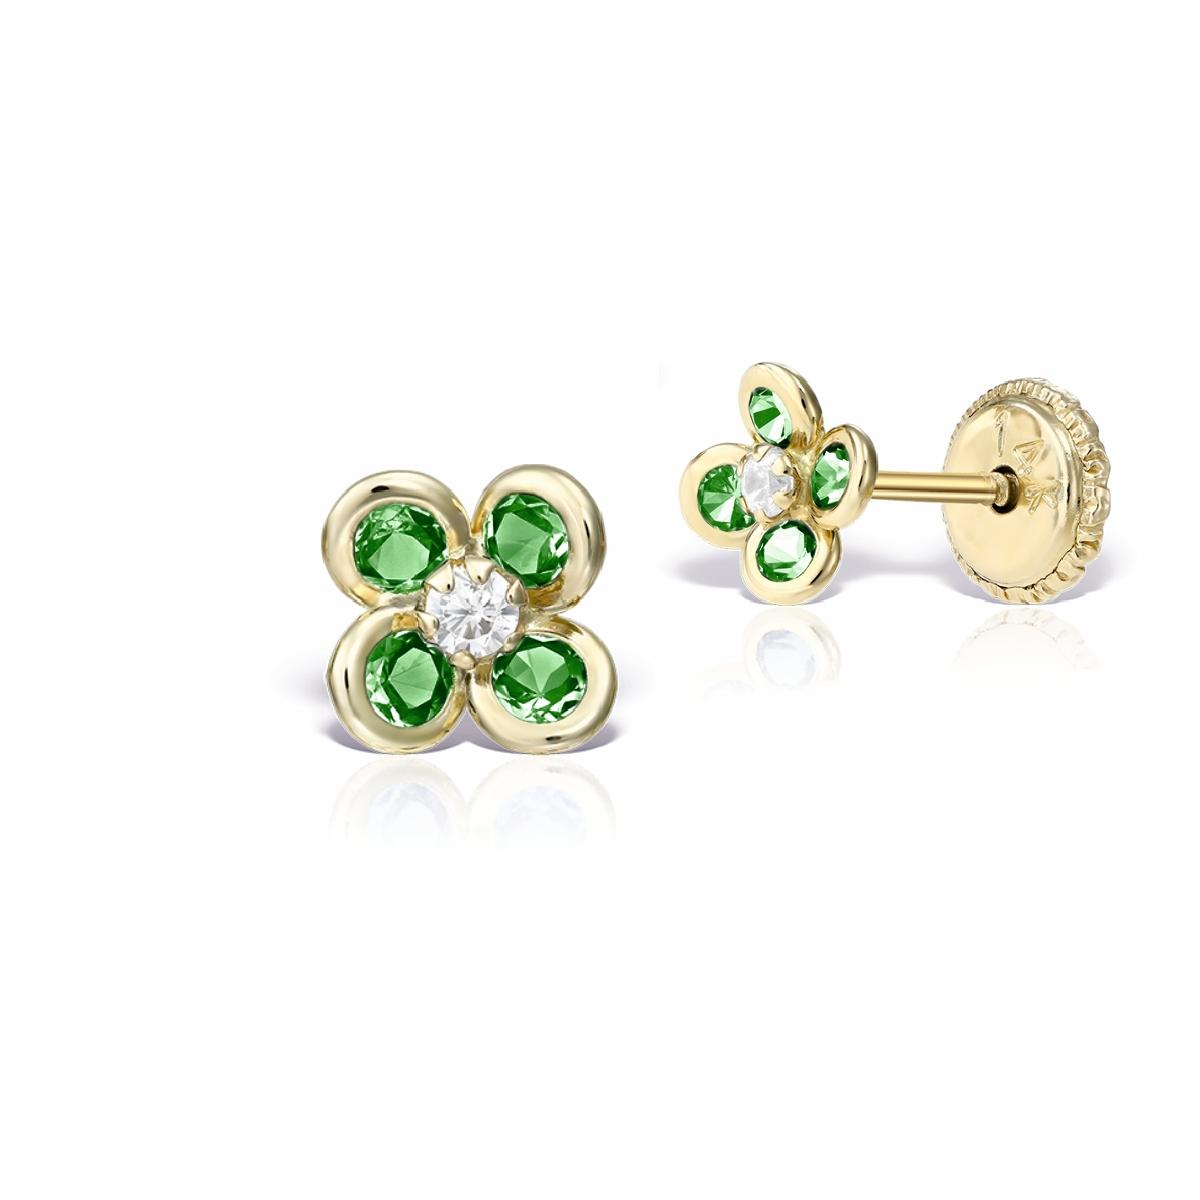 Cercei copii aur pietricele verzi